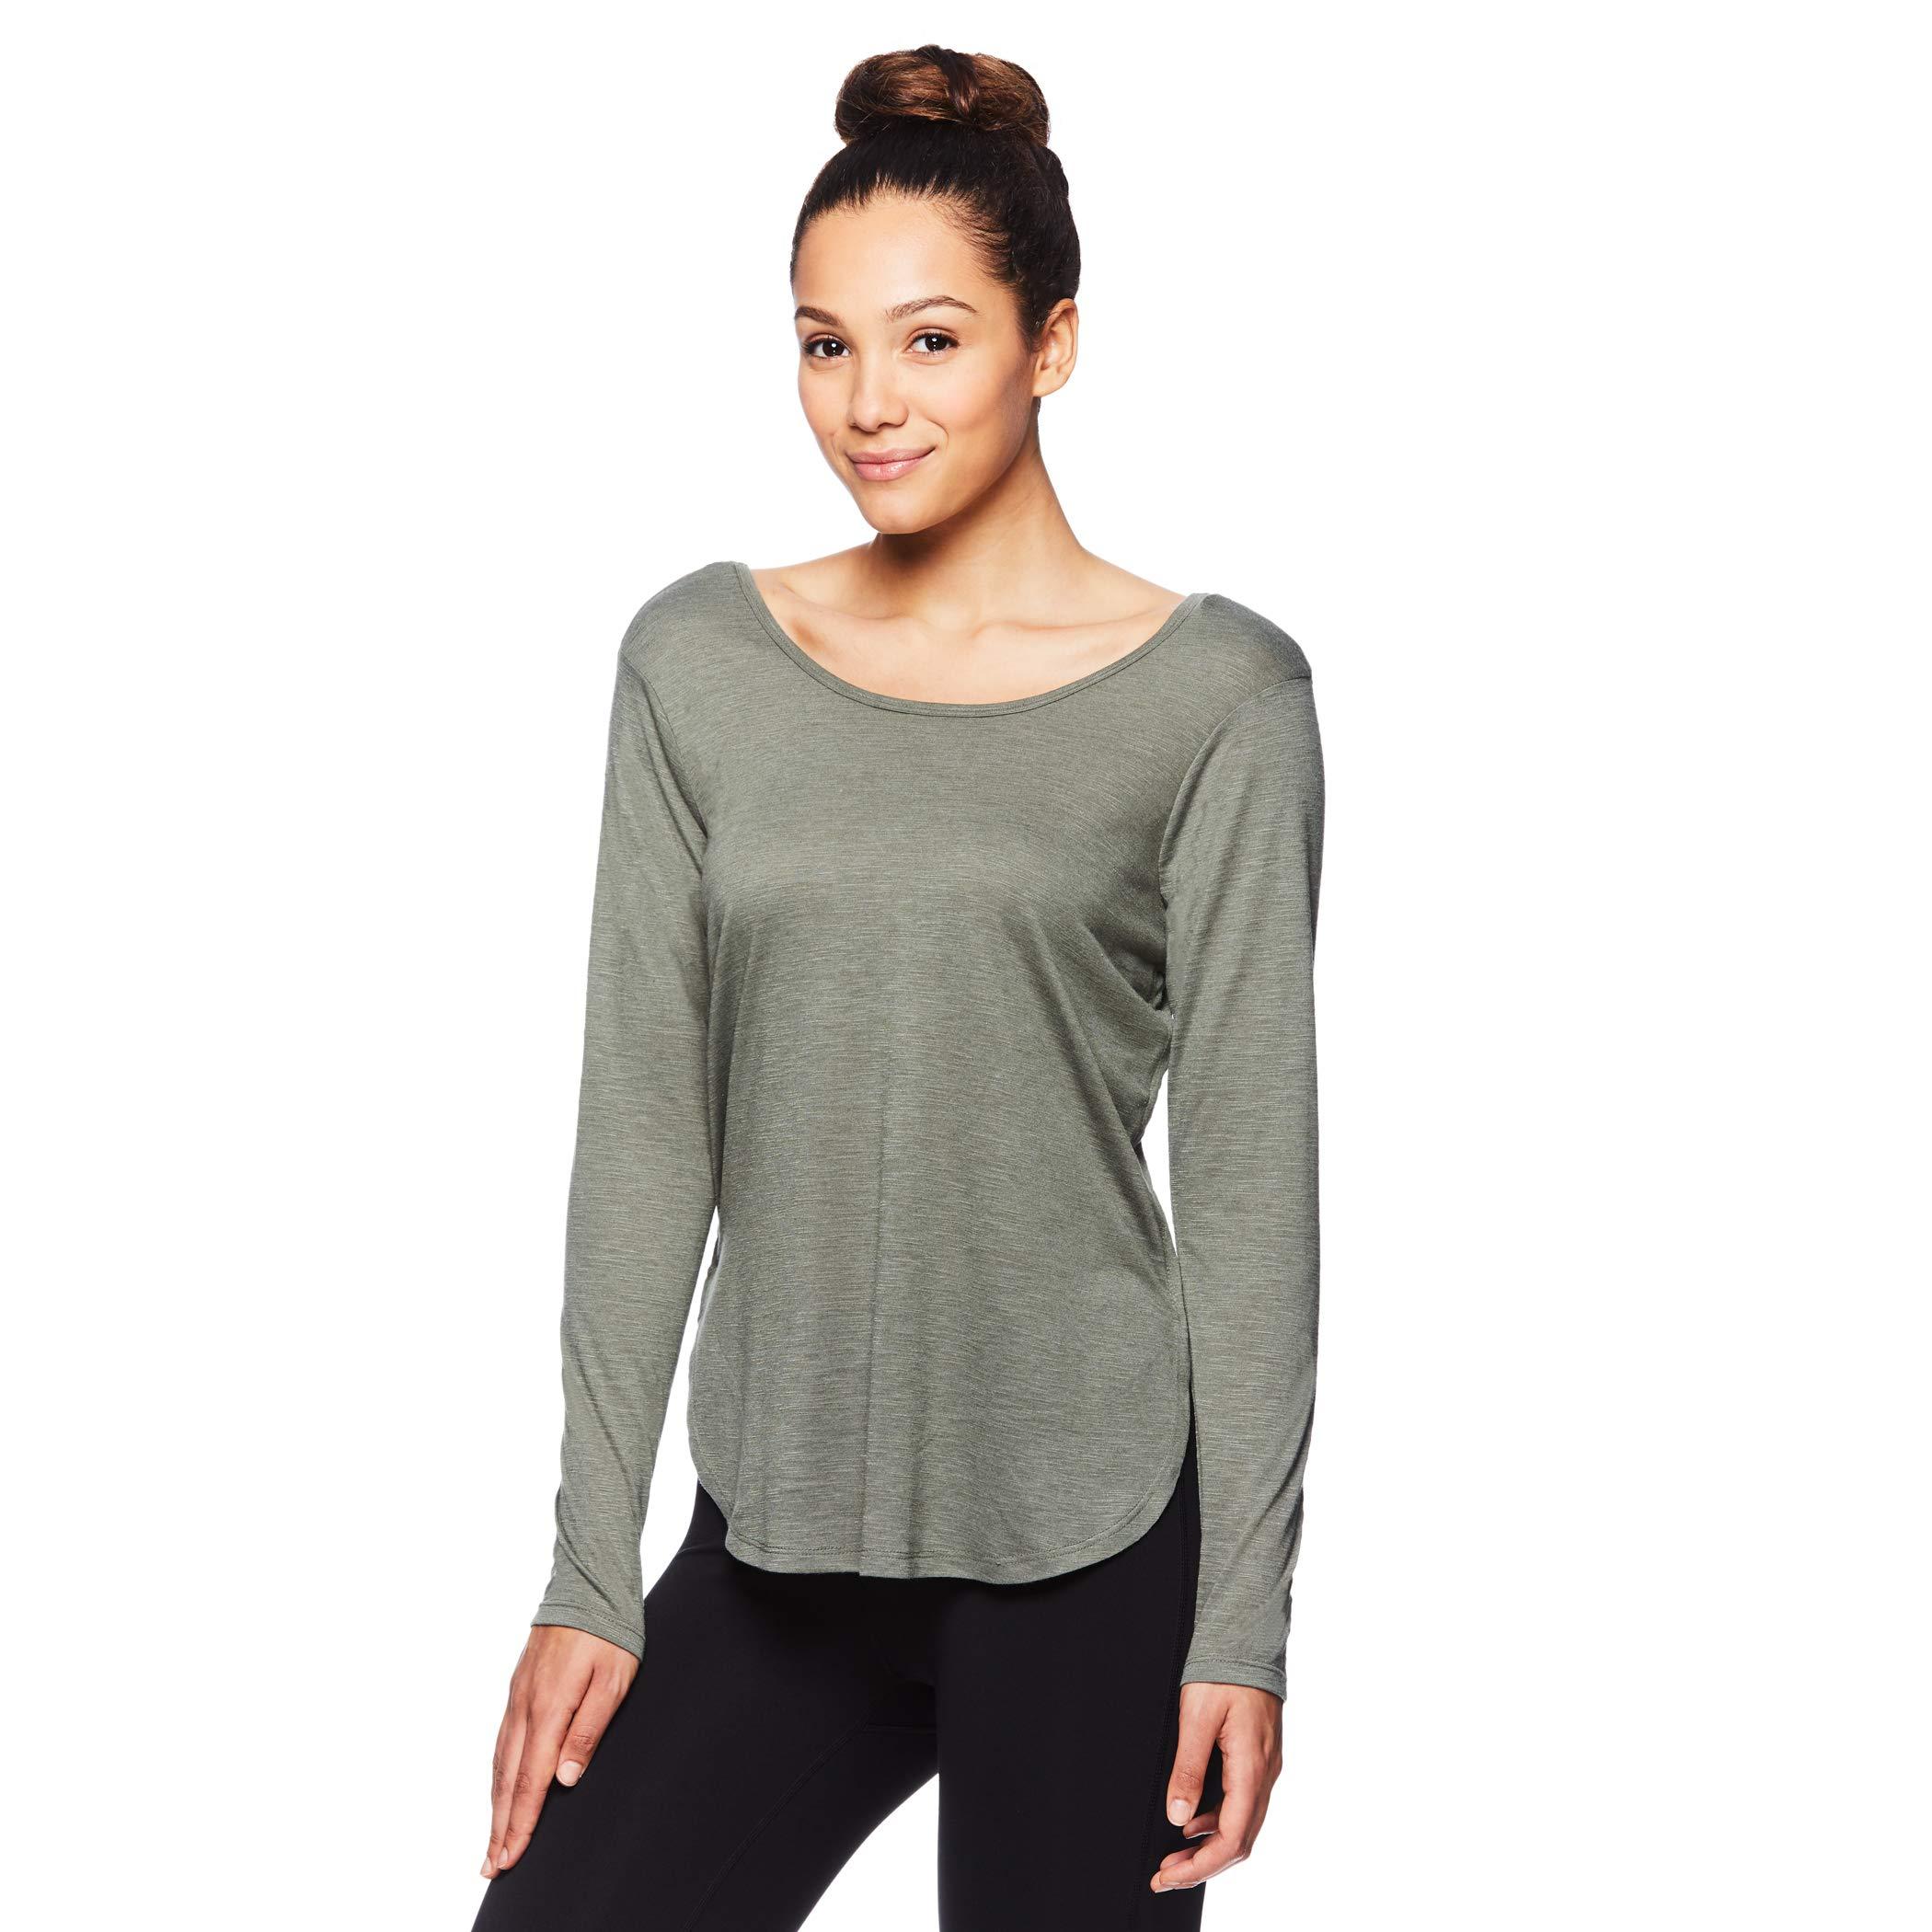 Gaiam Women's Strappy Open Back Yoga Shirt - Long Sleeve Activewear Top w/Side Slits